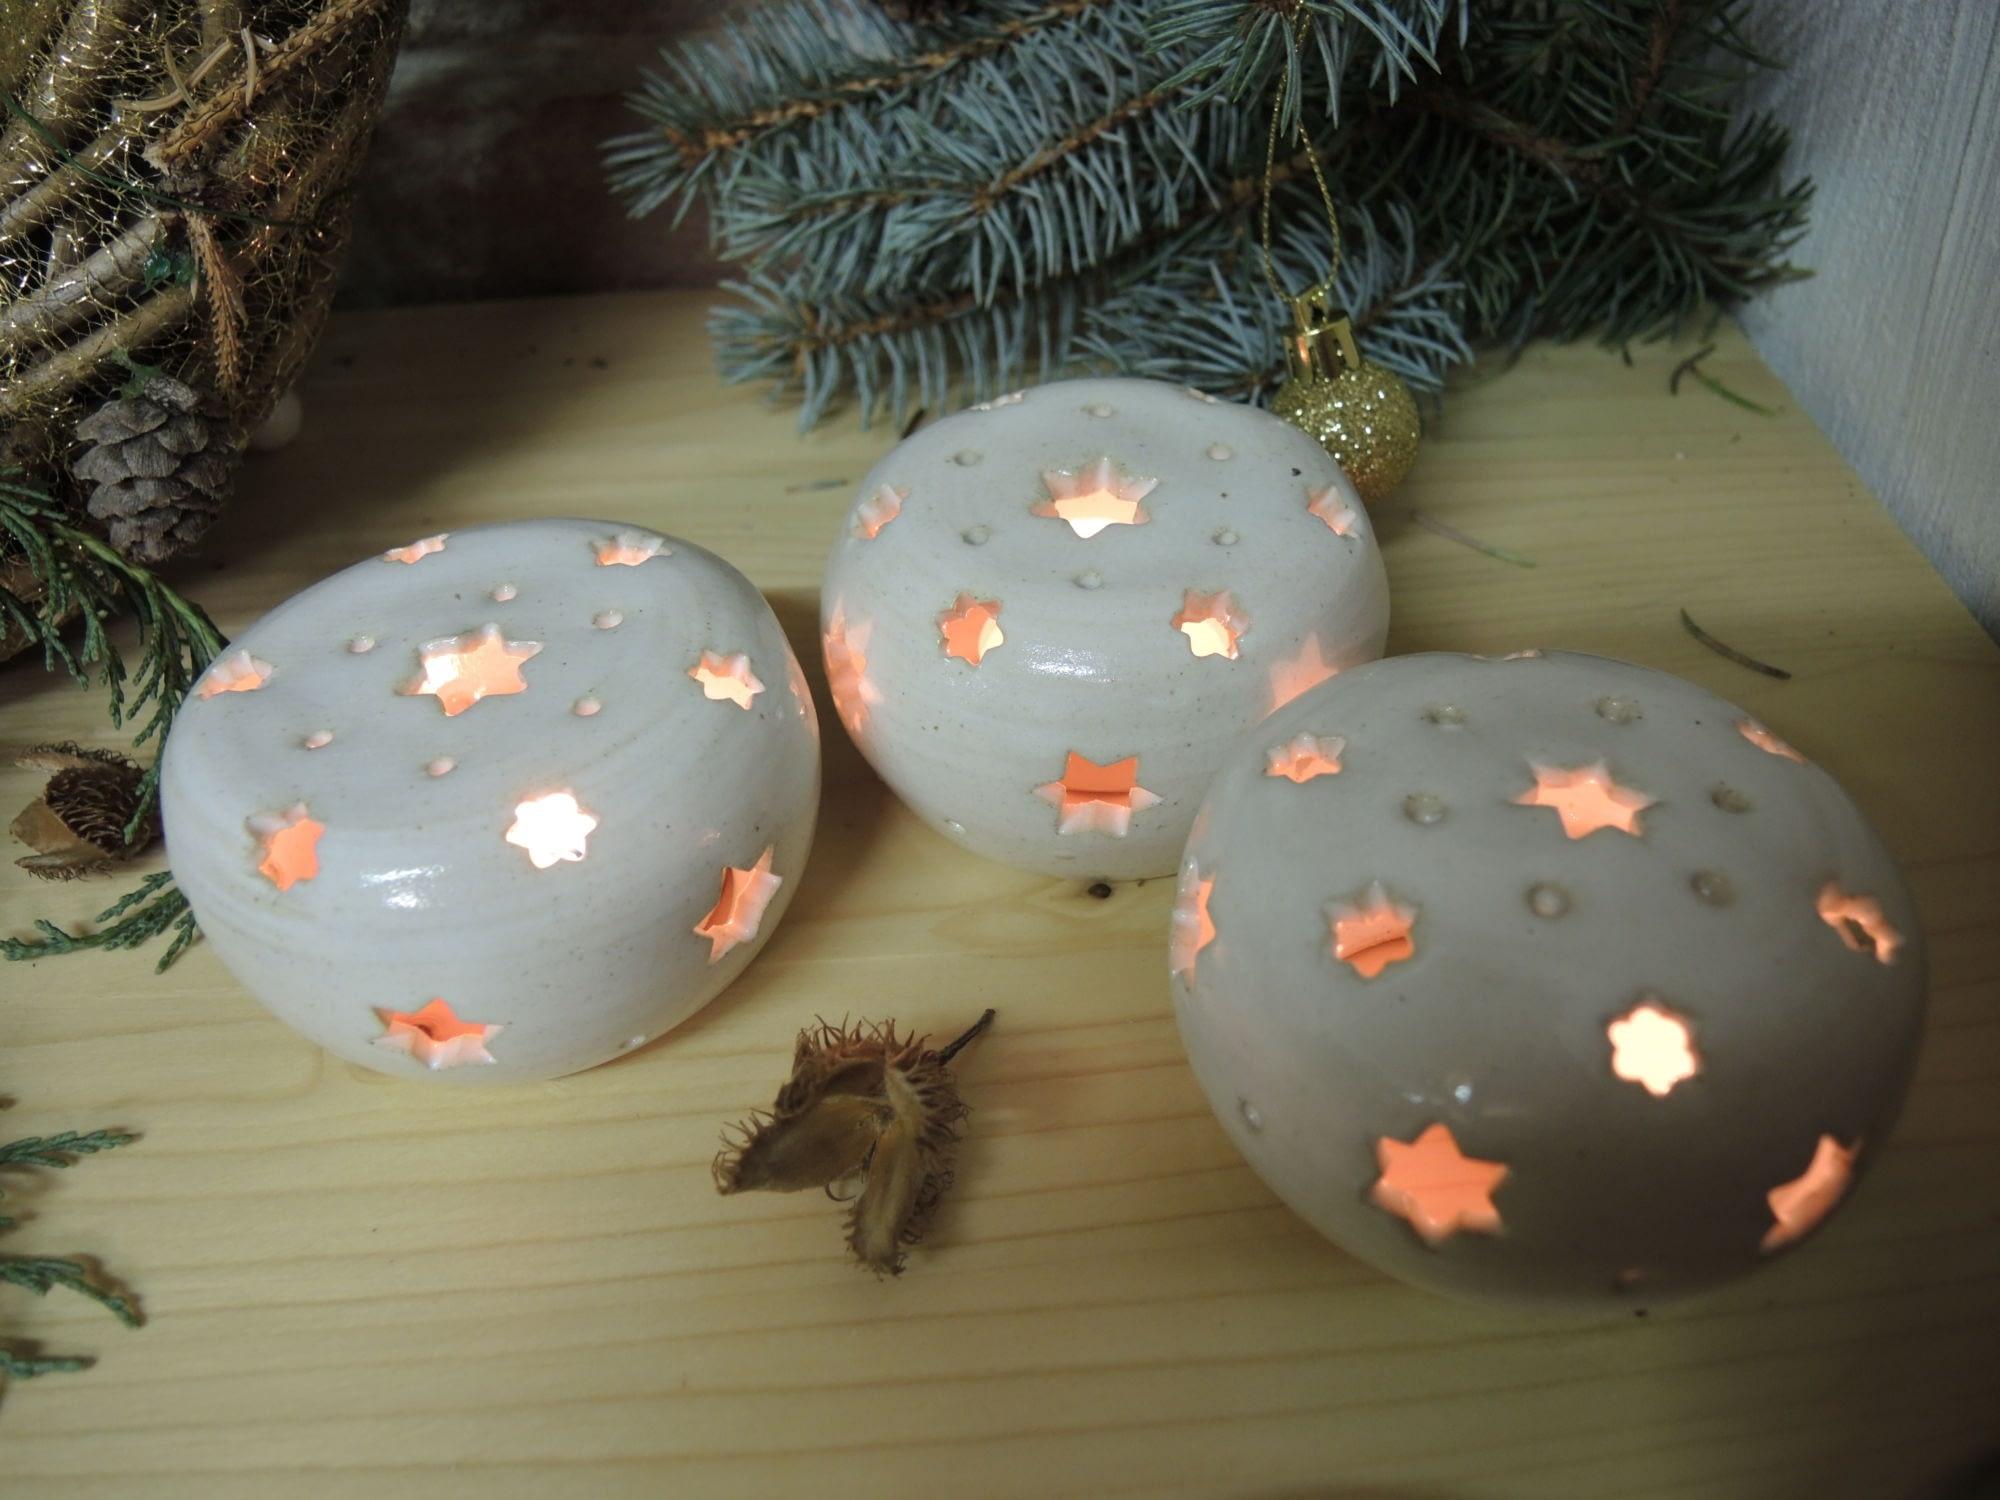 lampa lampička koule bílá hvězda světlo vánoce keramika keramikaandee dekorace